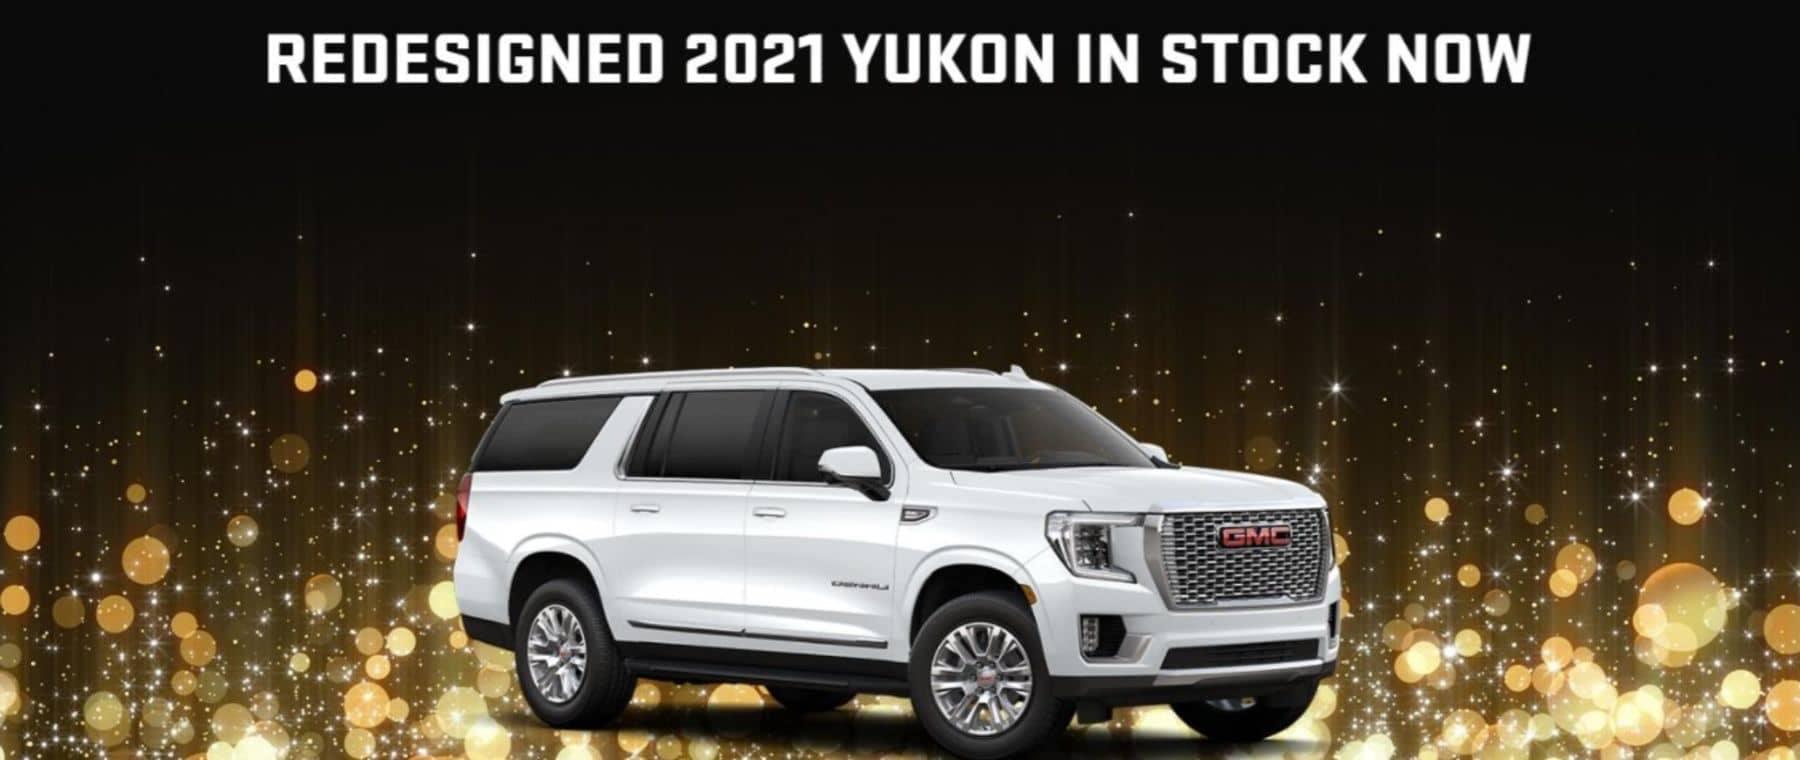 21 Yukon In Stock